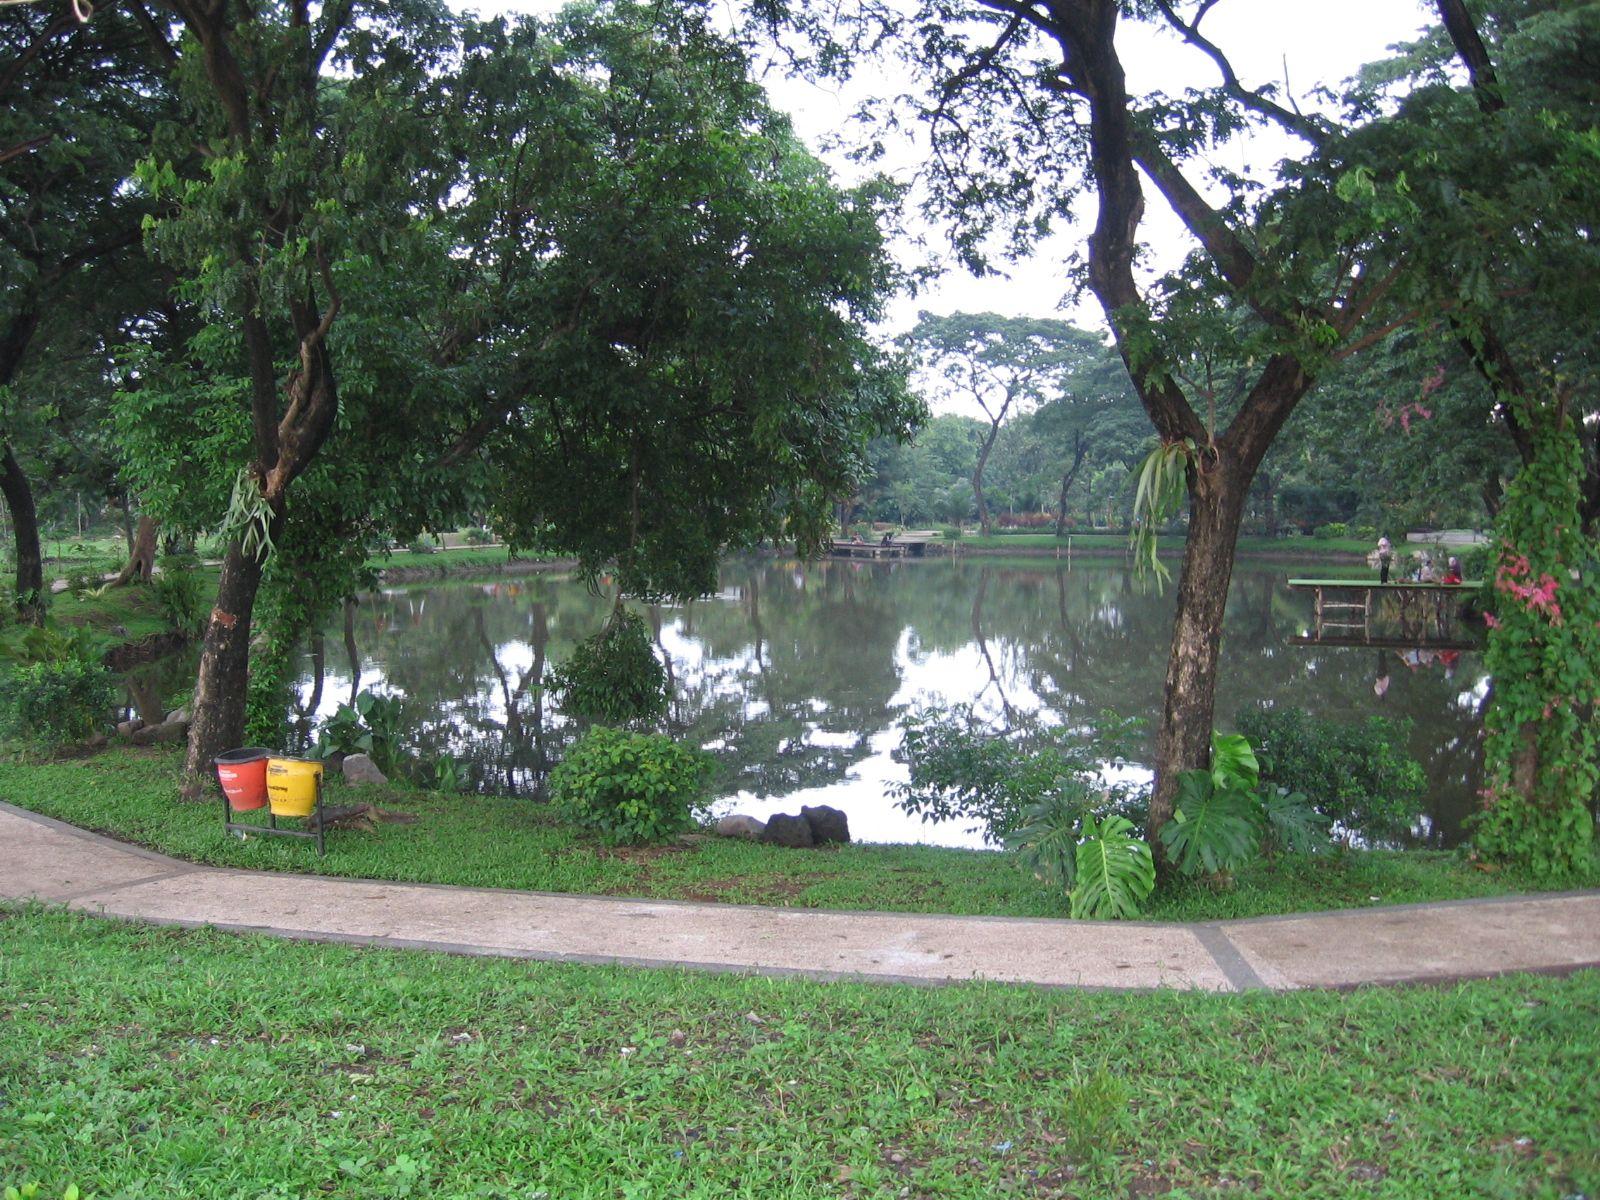 Kebun Bibit Wonorejo Surabaya Kota